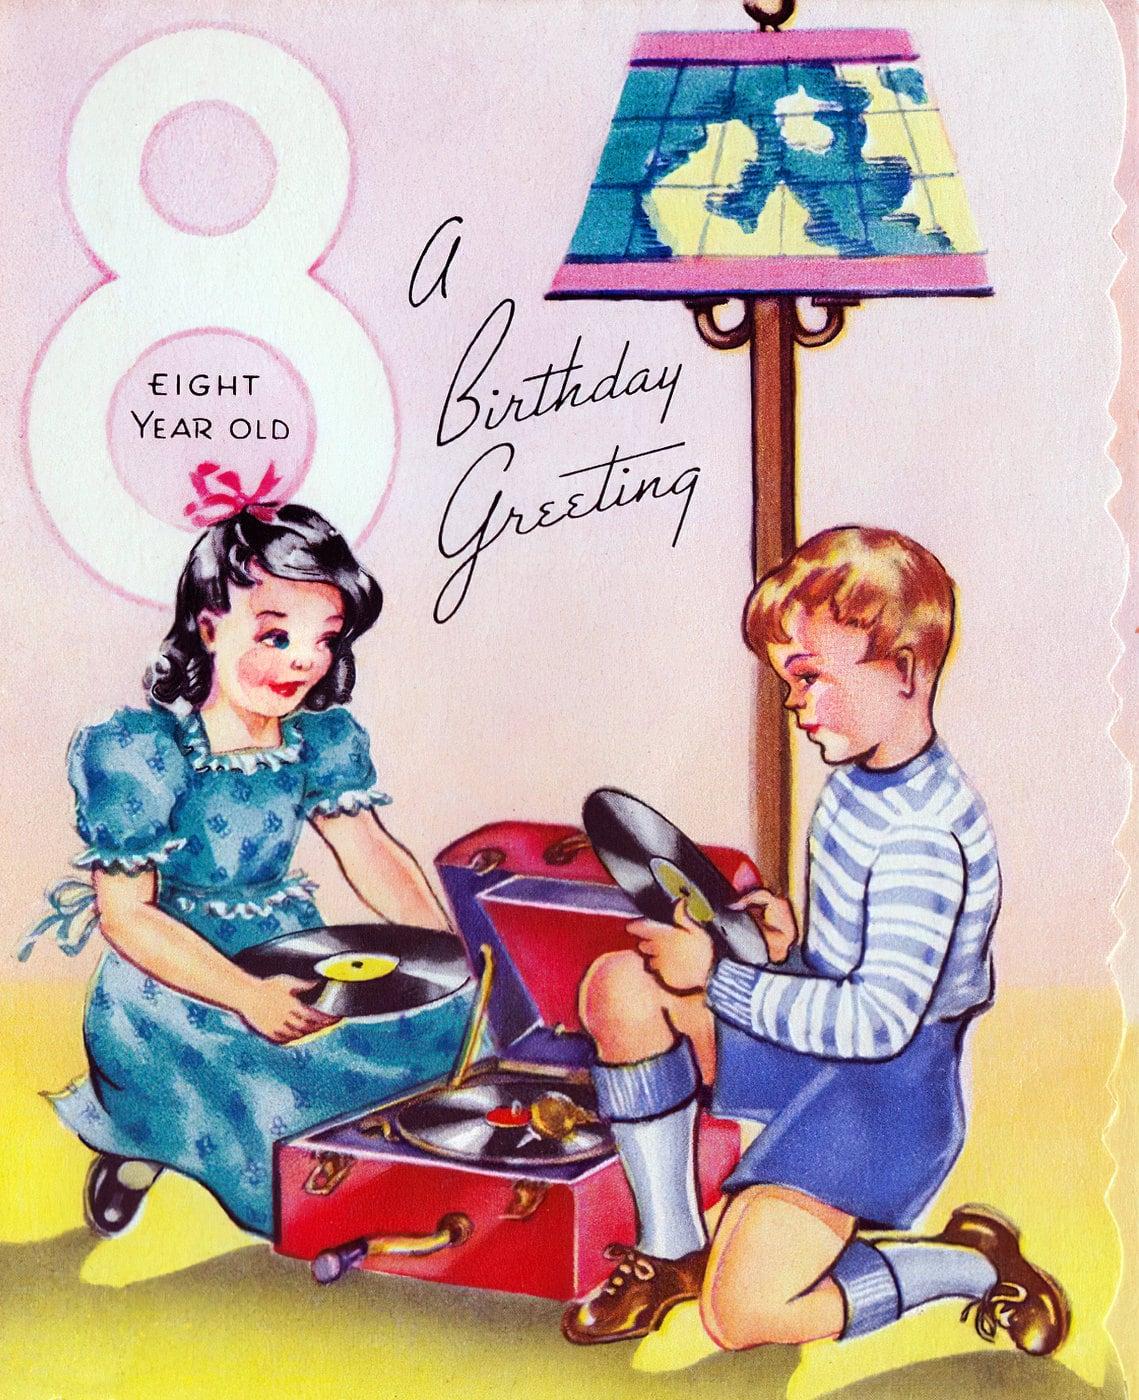 A birthday greeting - Vintage 1940s card